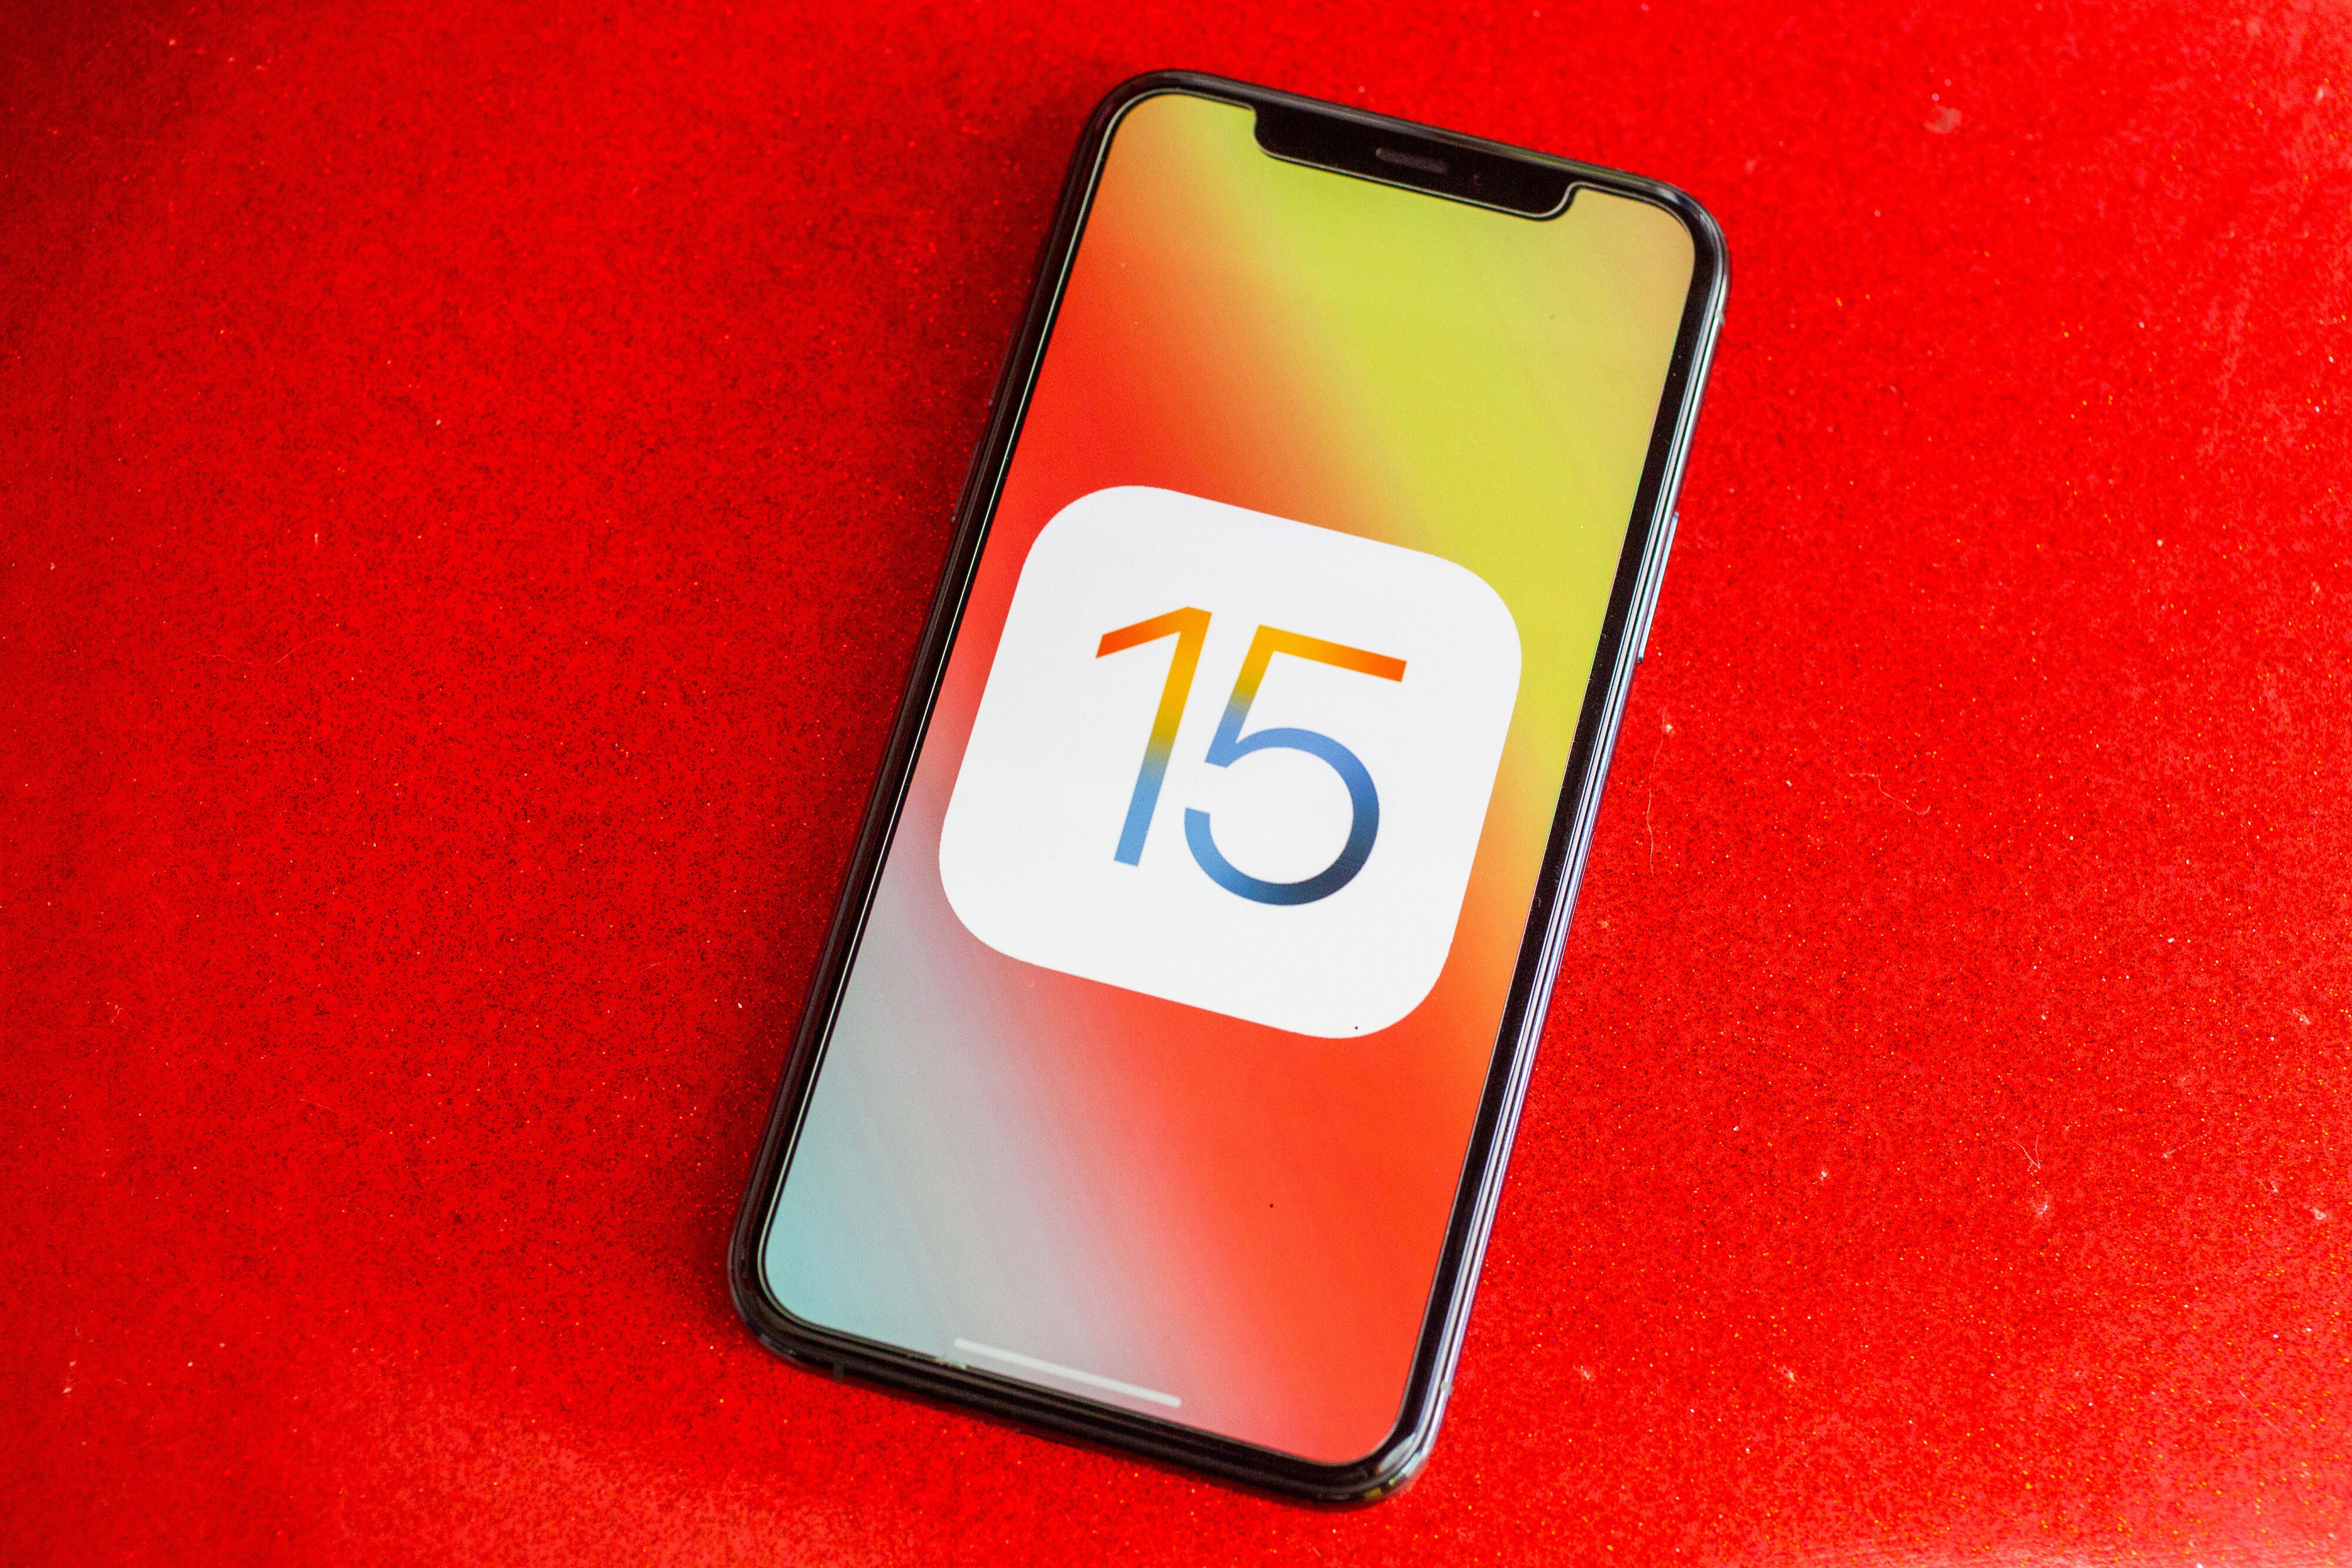 iphone-ios-15-2021-cnet-22